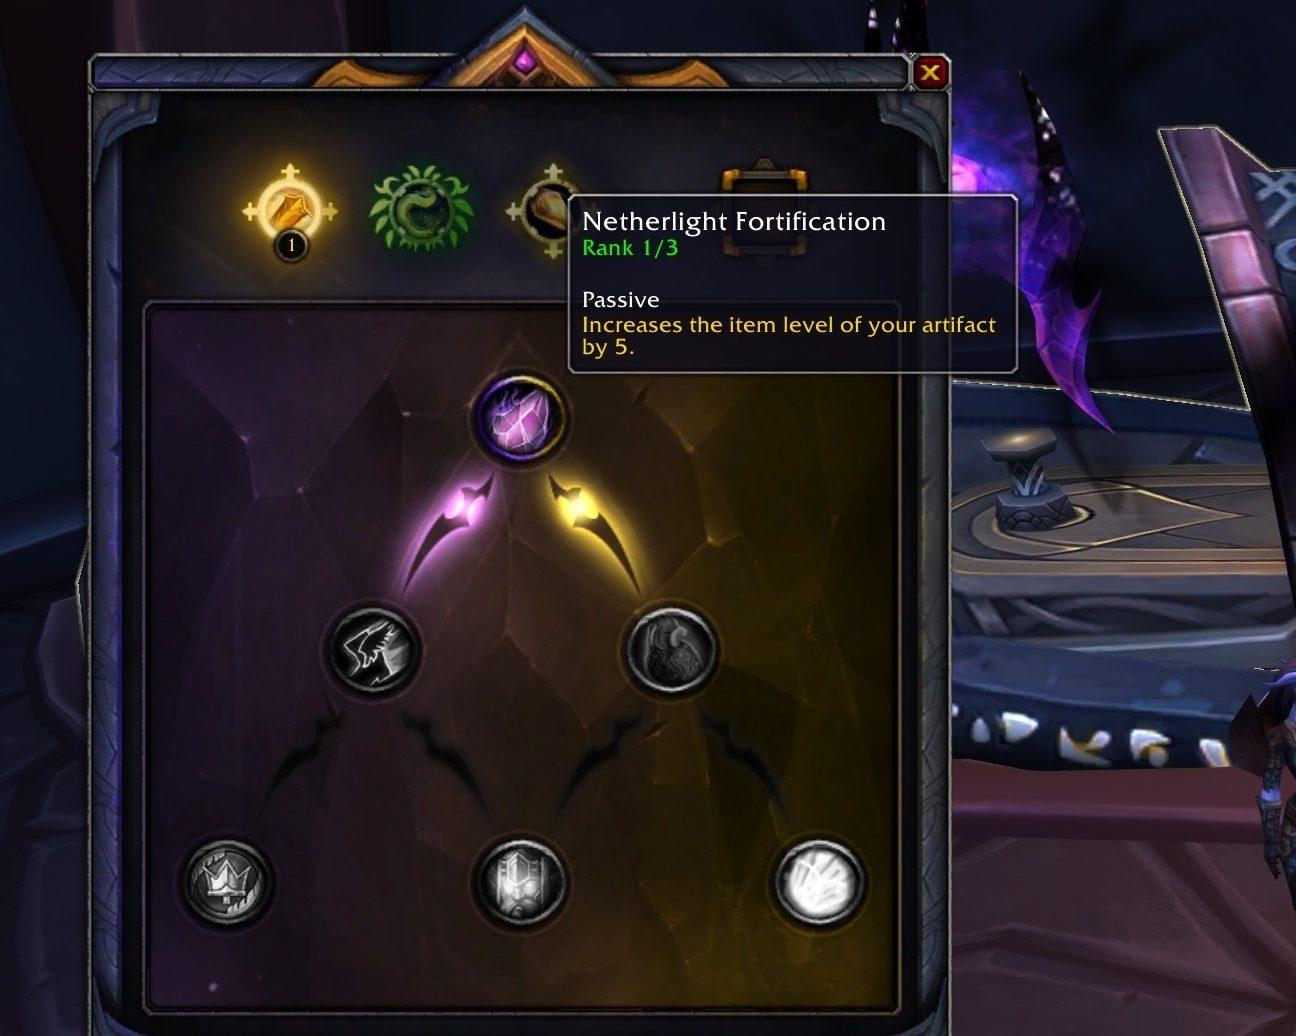 WoW Netherlight Crucible Upgrade